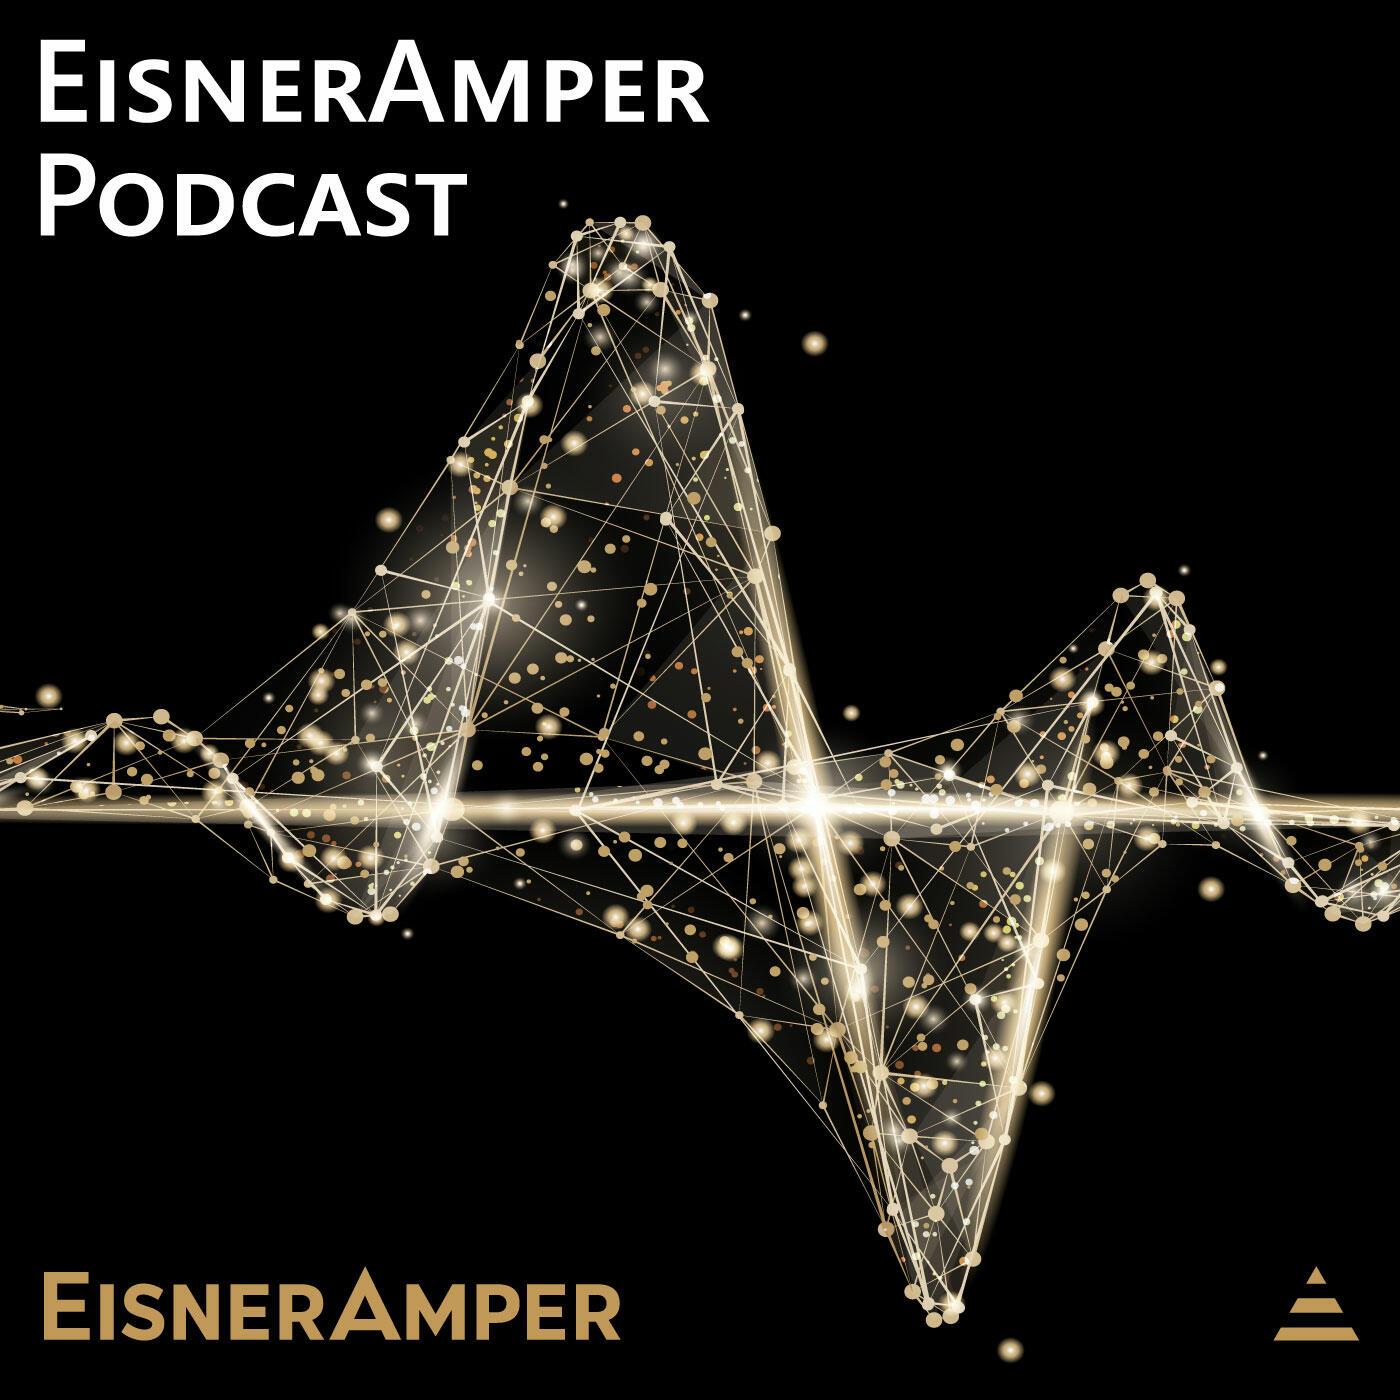 EisnerAmper Podcast